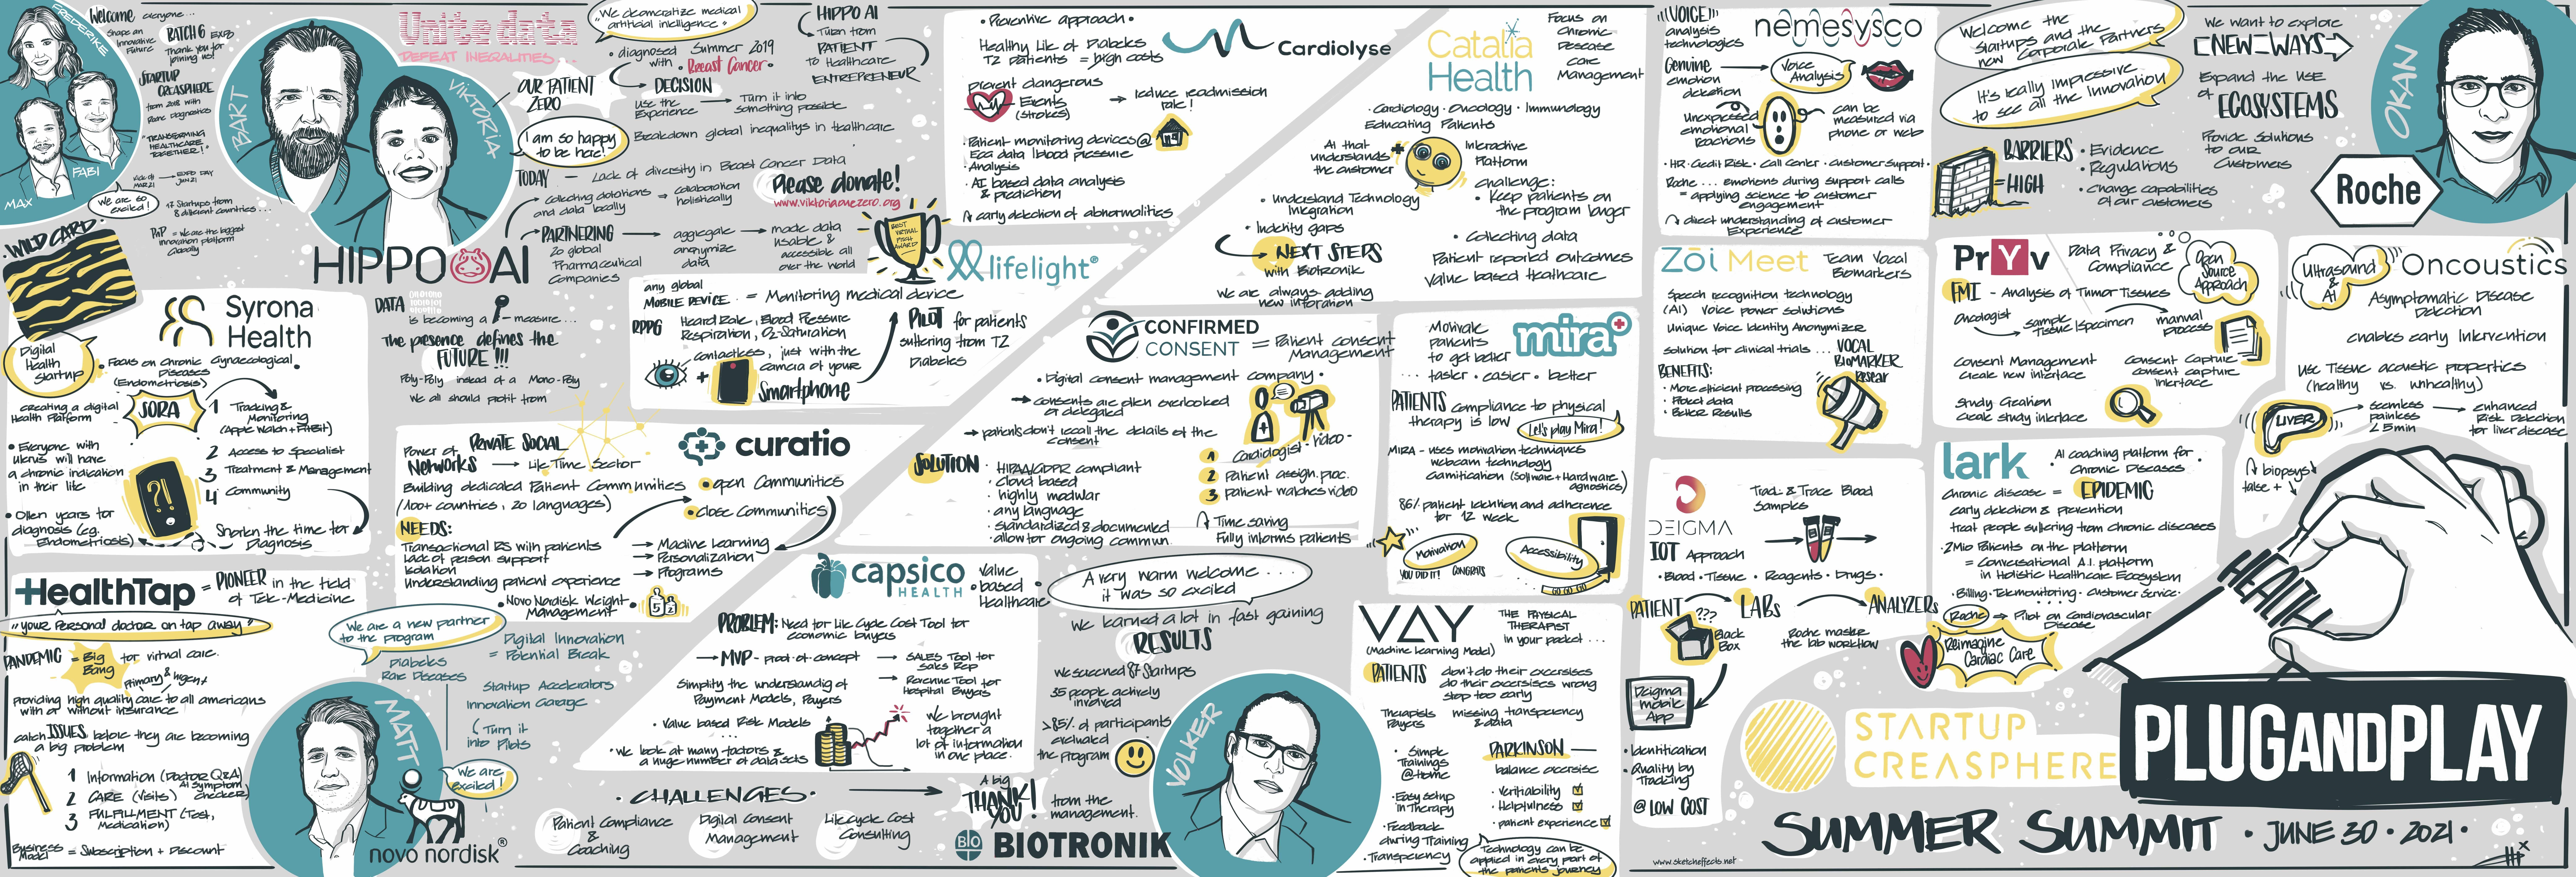 Startup Creasphere EXPO6_Scribbling Olivia-min.jpeg